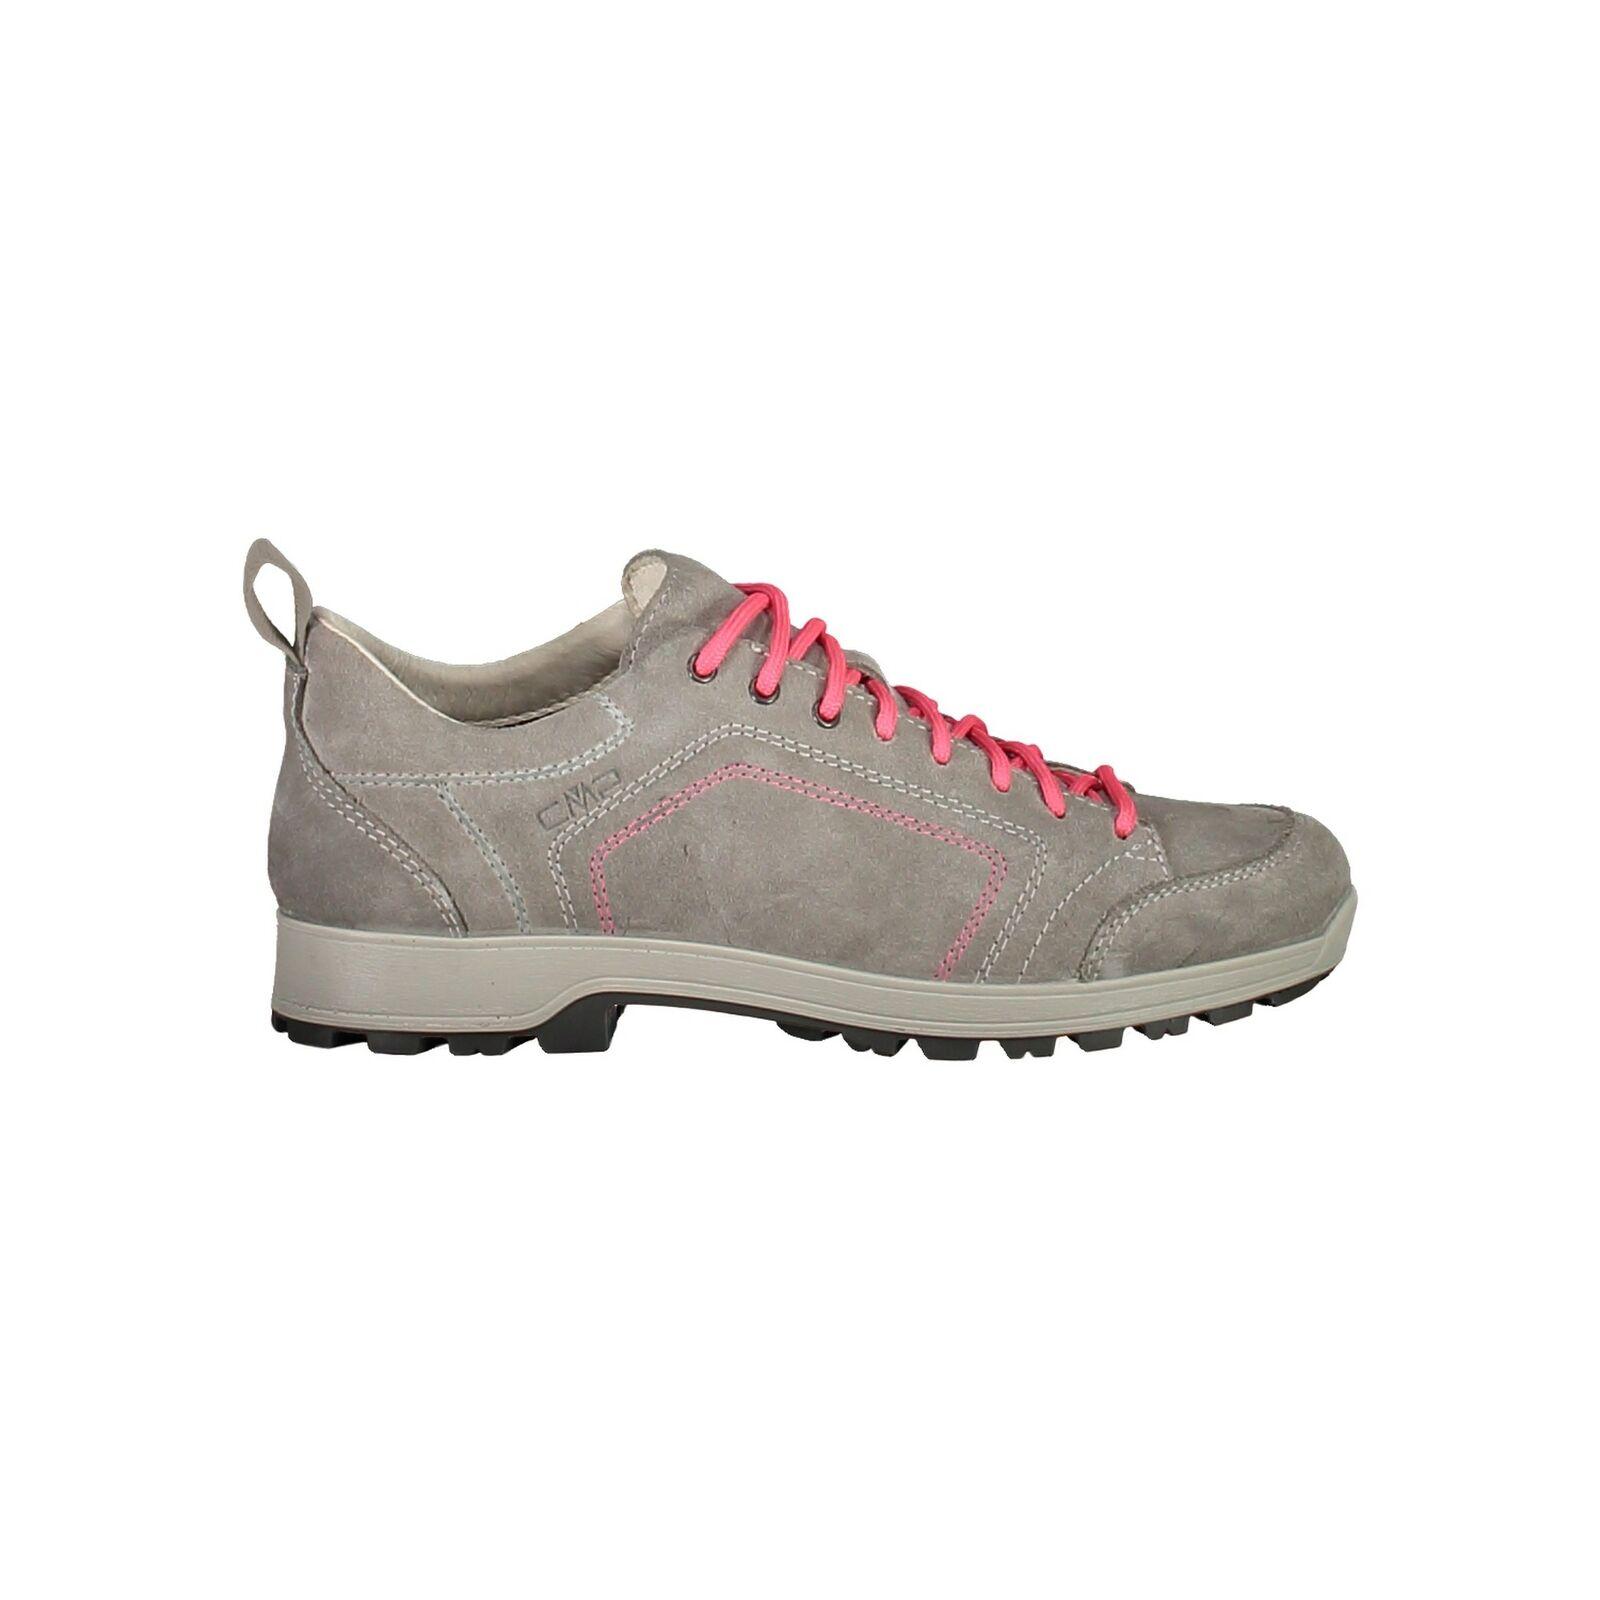 CMP Scarponcini outdoorschuh Atik WMN HIKING scarpe GRIGIO leggermente tinta